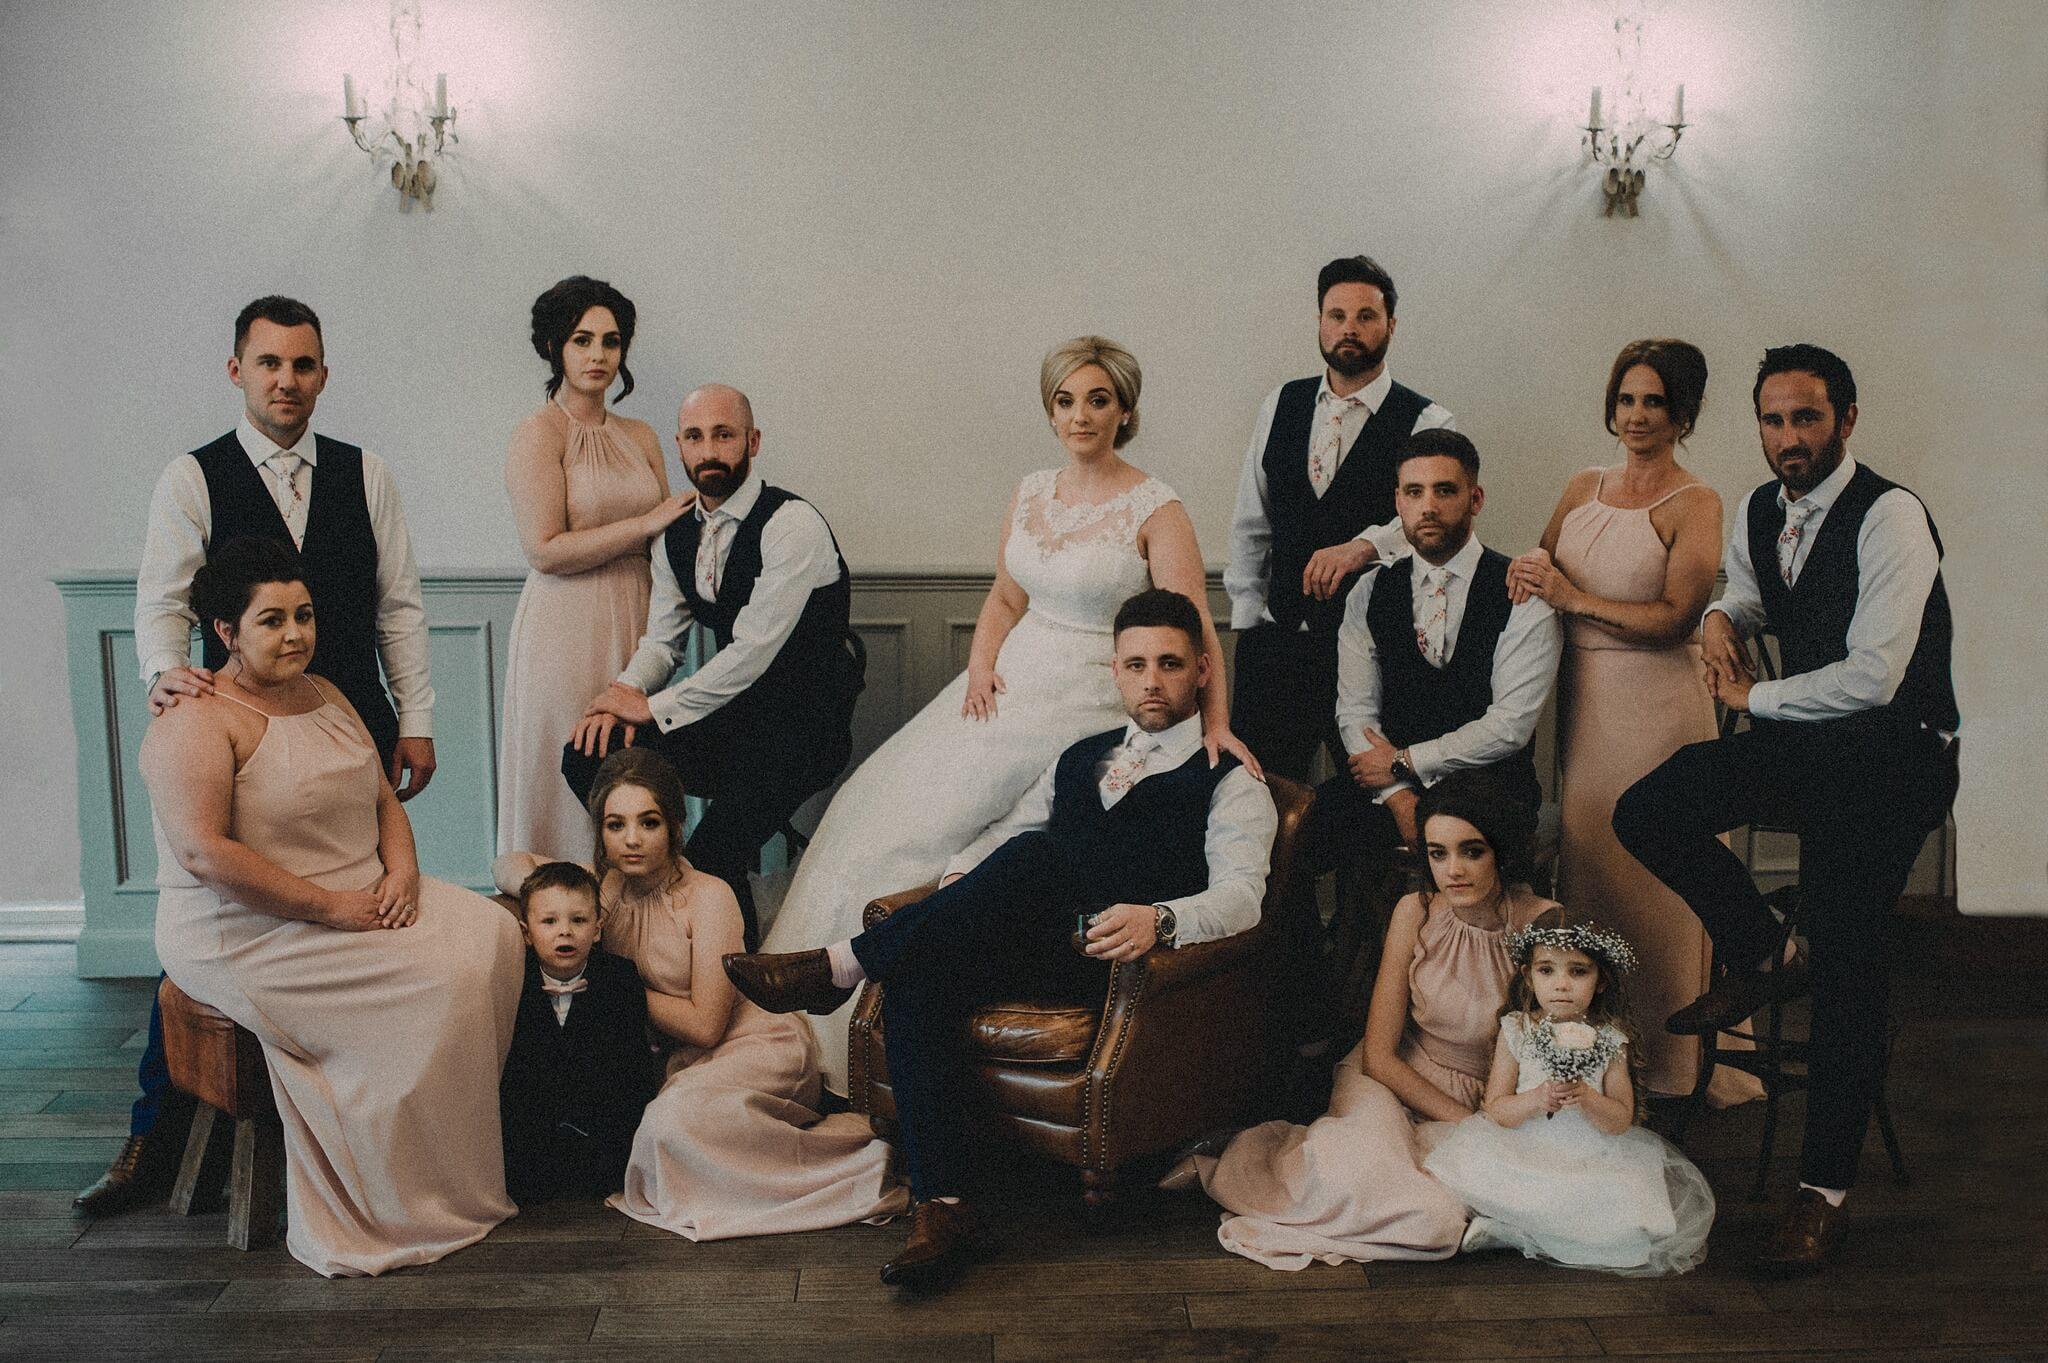 wedding-photographer-and-videographer-bryngarw-house-brynmenyn-bridgend-uk-07